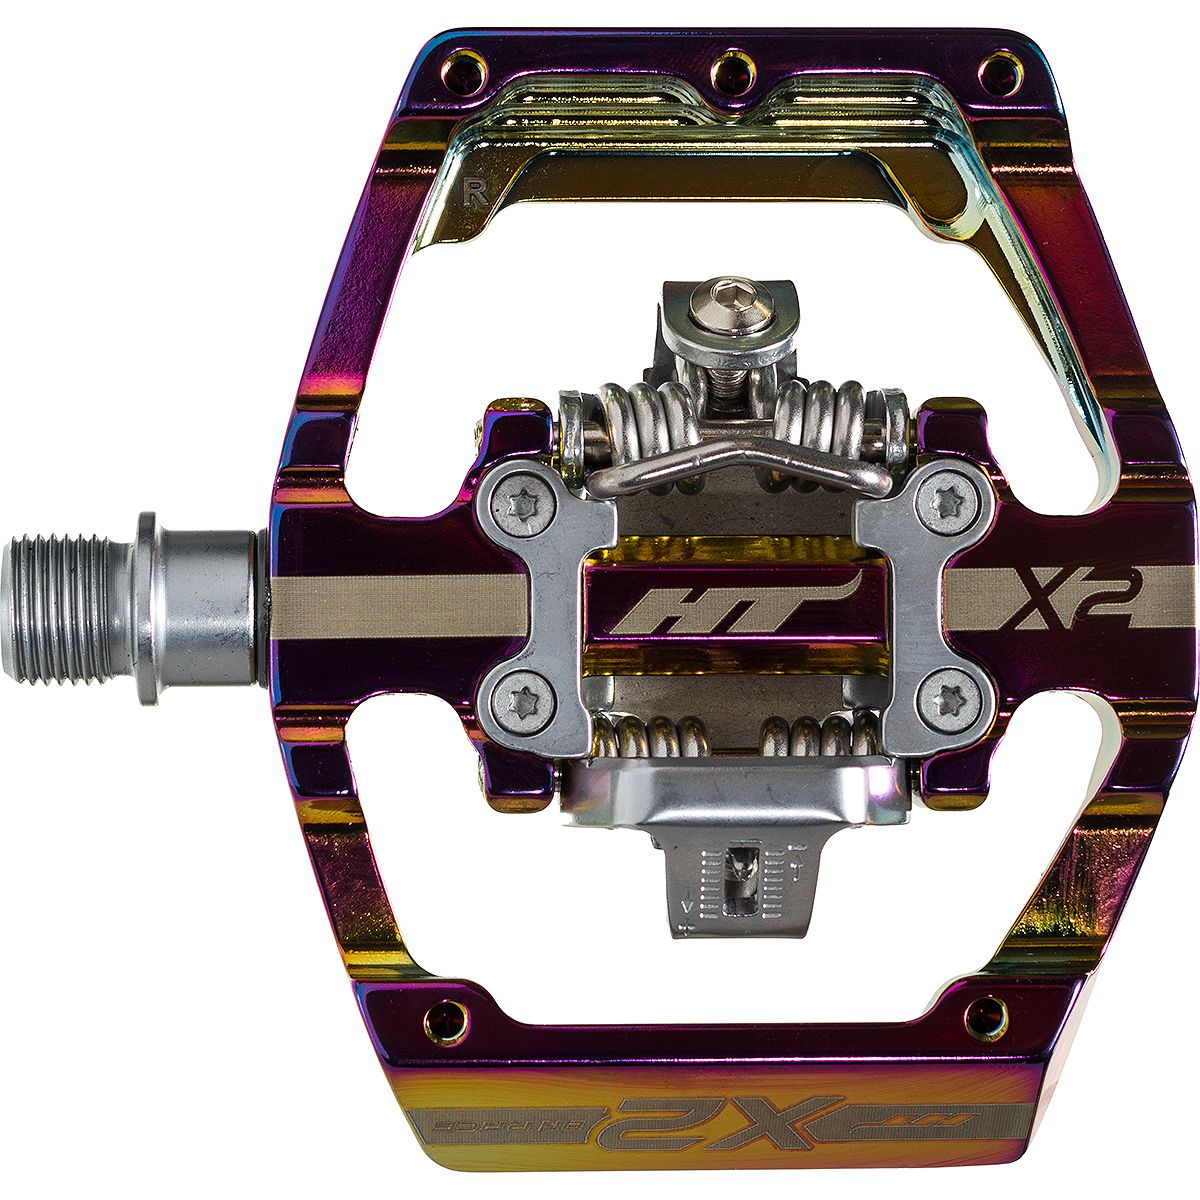 HT pedal cleats X2 Pro   BMX MTB racing downhill